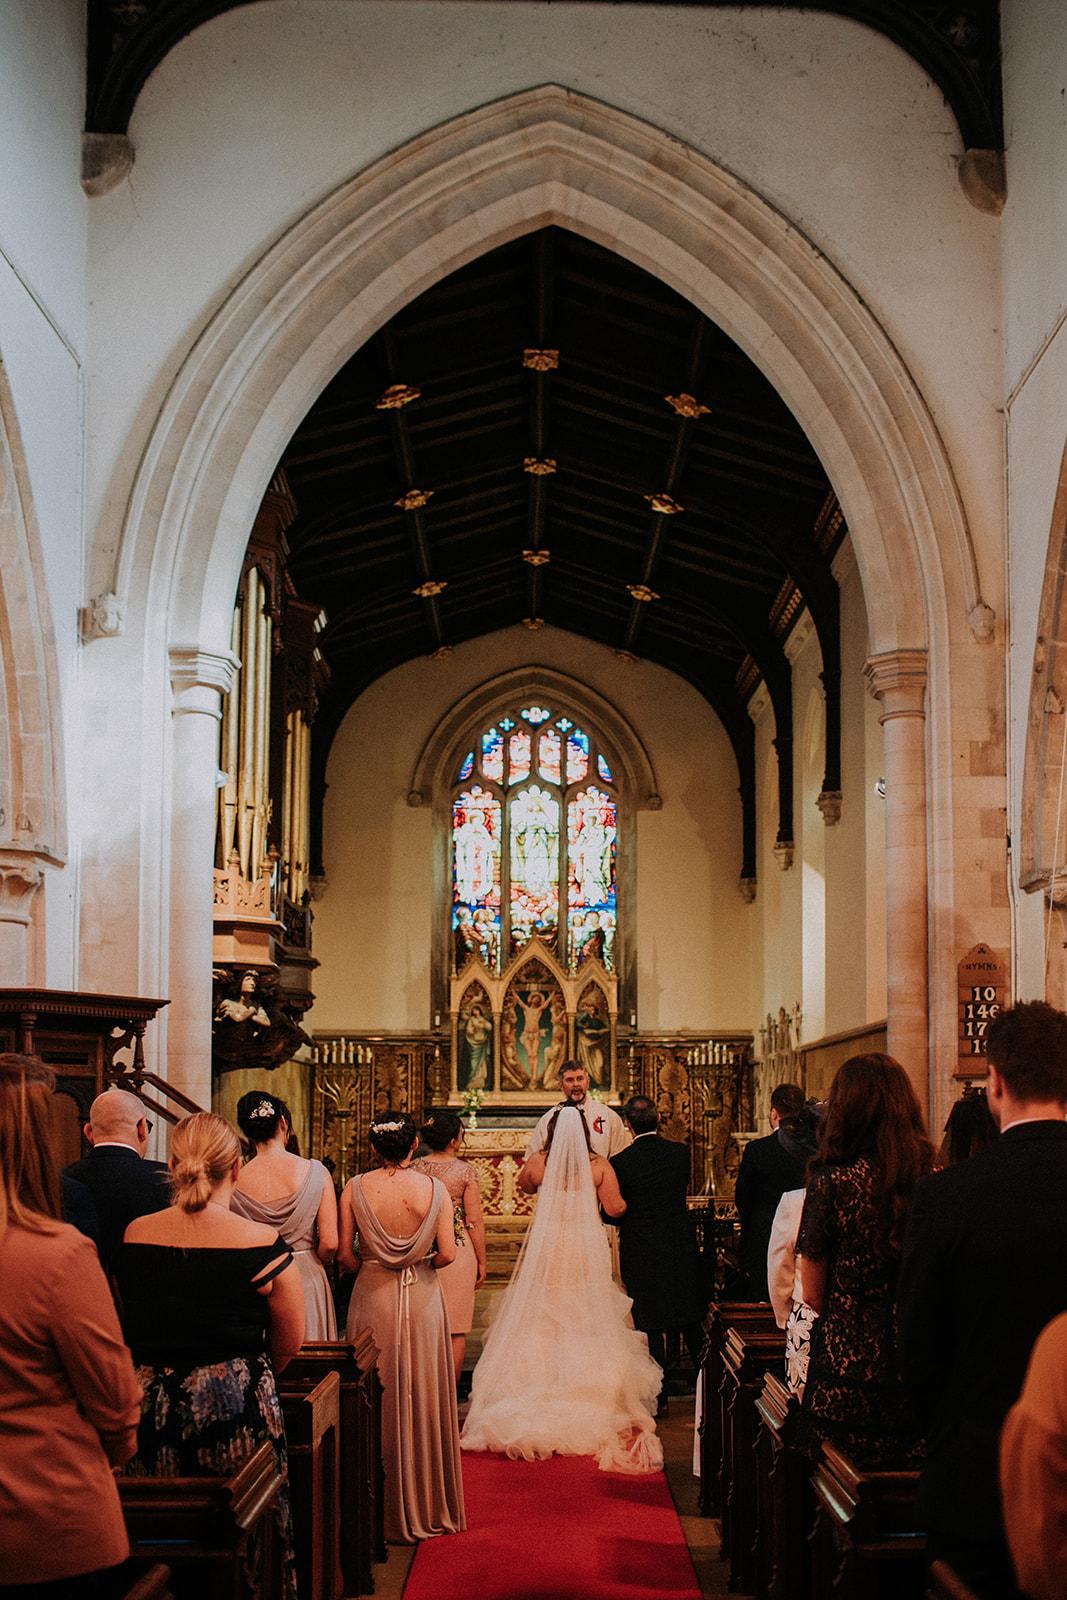 church wedding ceremony - rutland wedding - fun wedding - east midlands wedding planner - Leicestershire wedding planning - unique wedding planner - that black and white cat